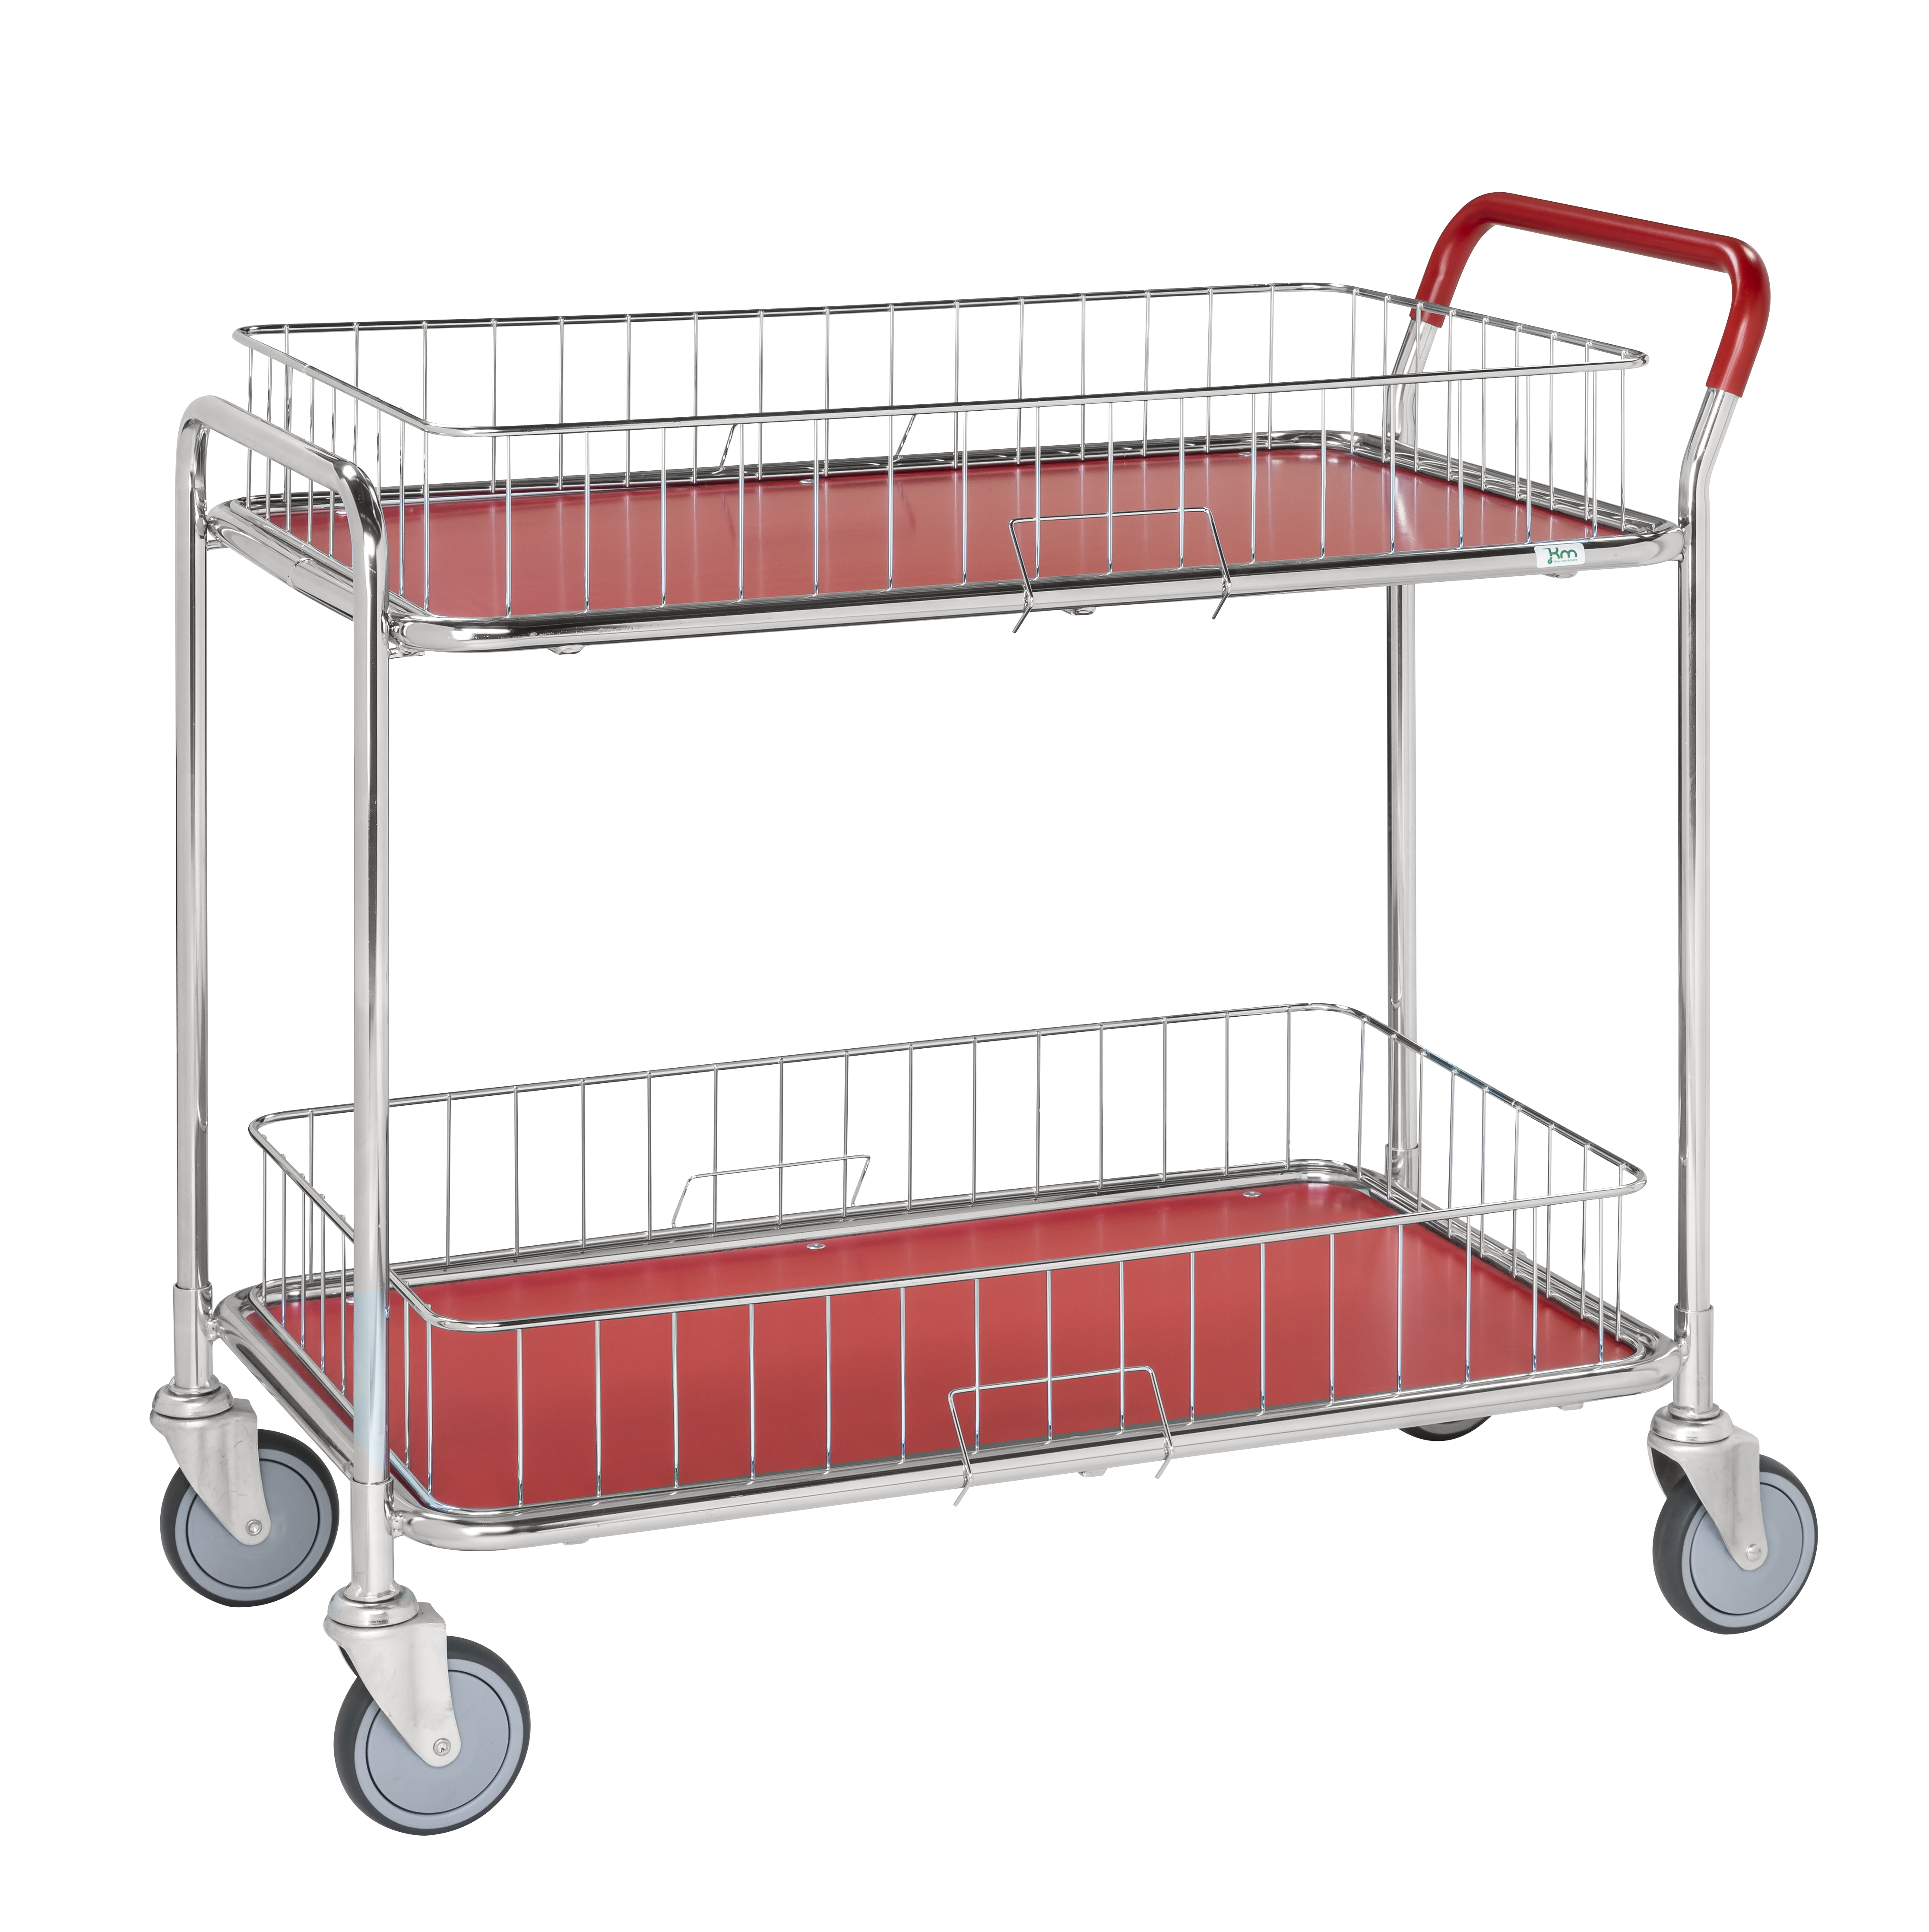 KM30770-1 | Table trolley